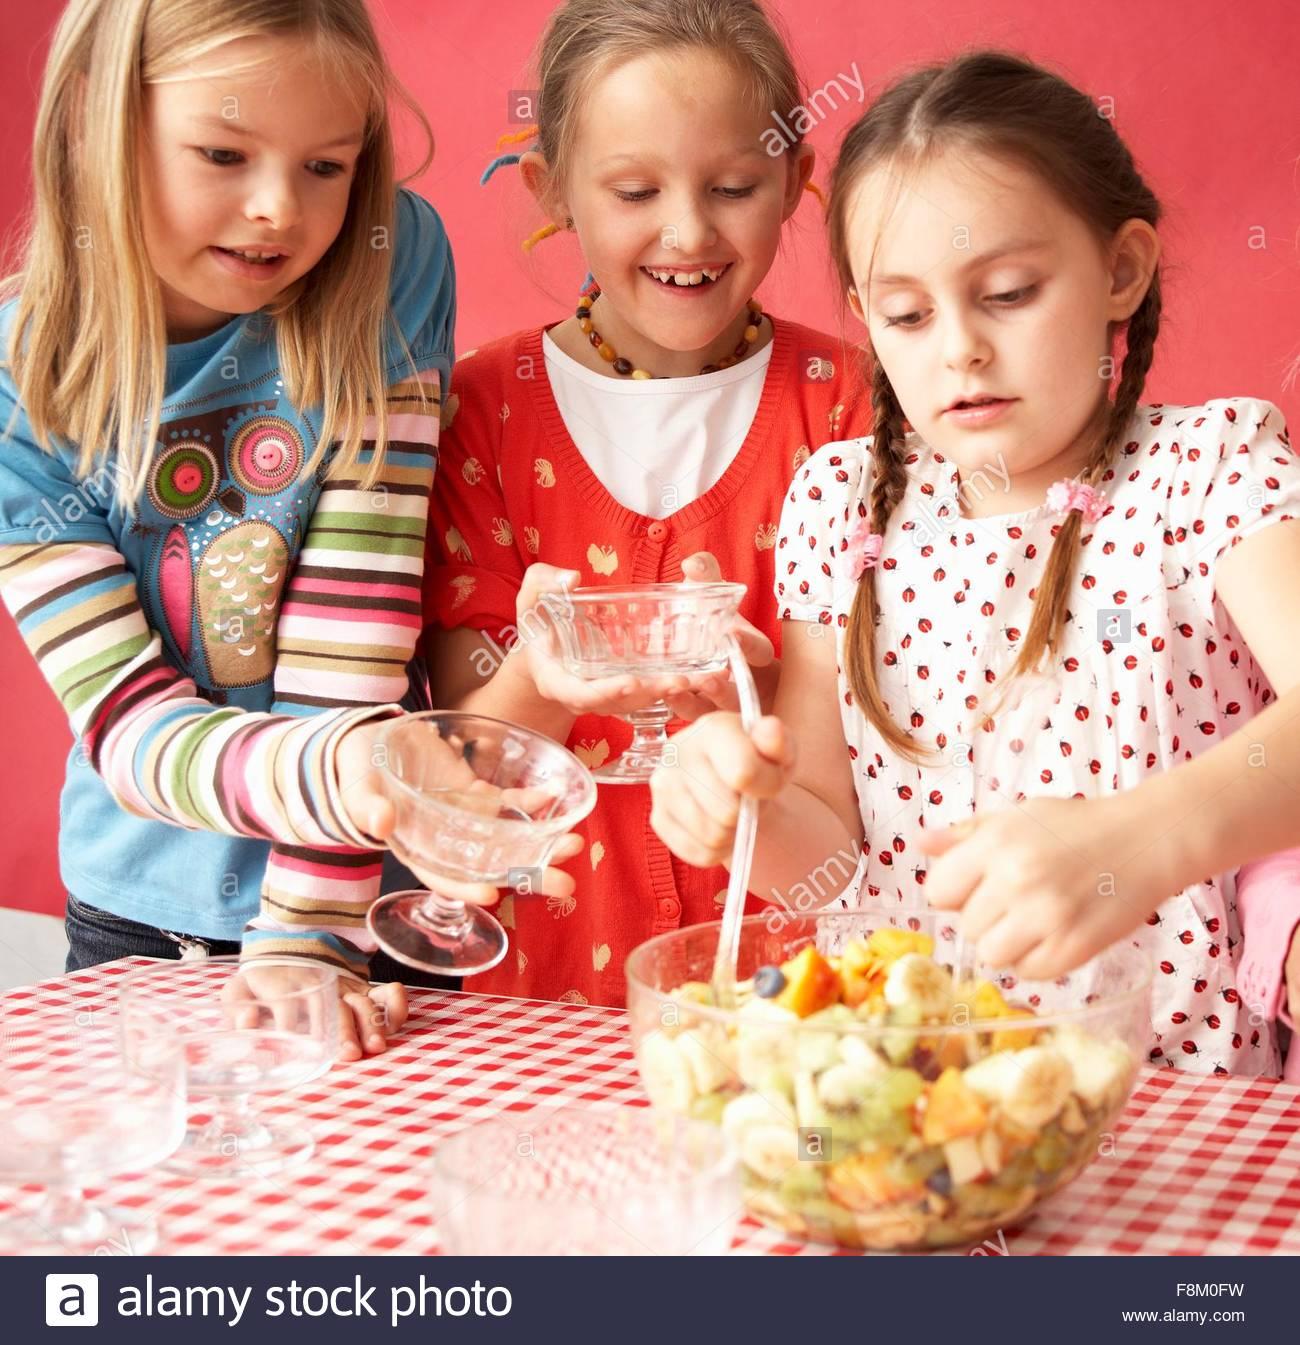 Drei Mädchen essen Obstsalat Stockbild